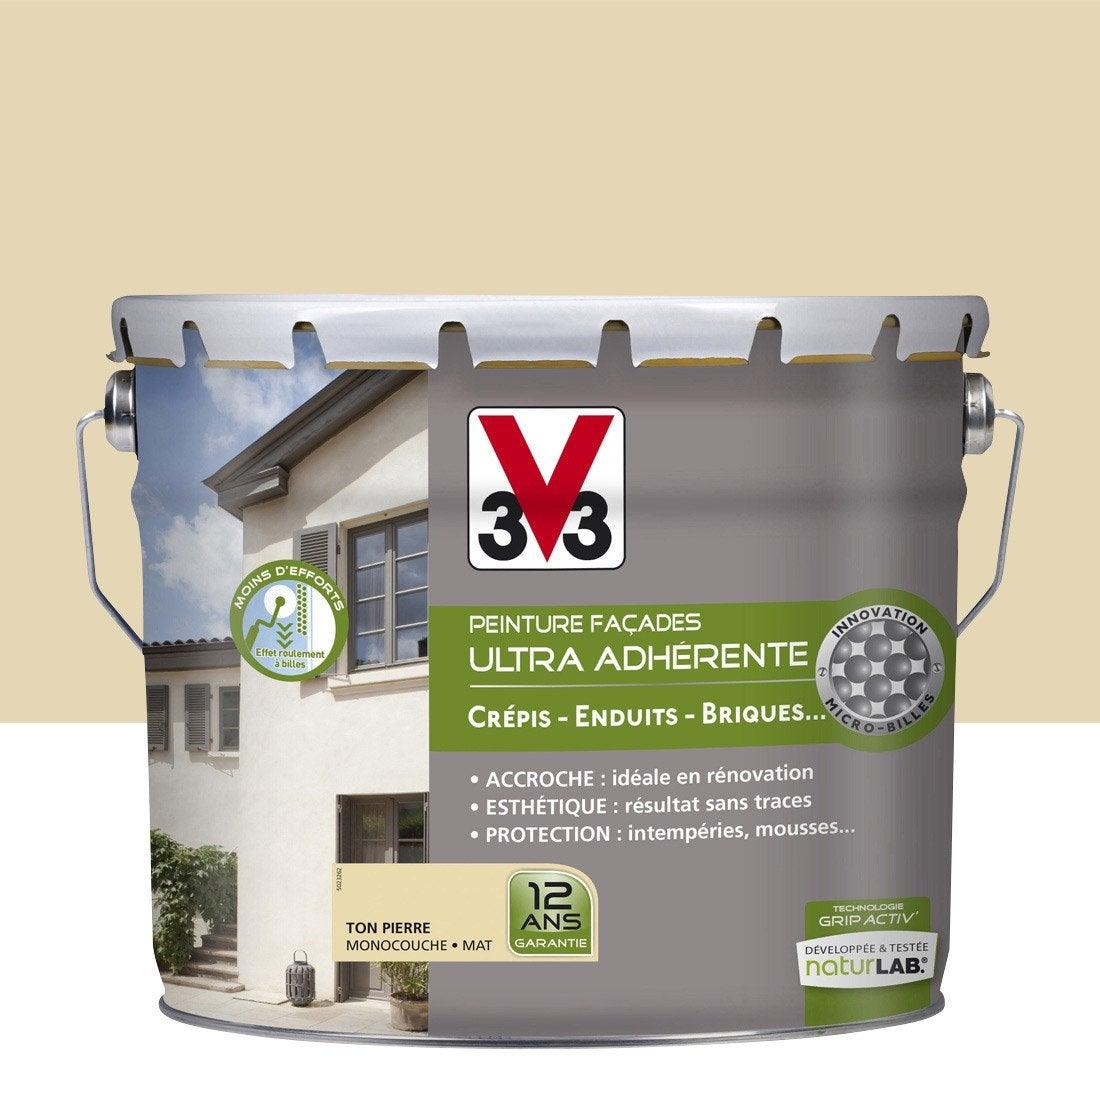 Peinture fa ade ultra adh rente v33 ton pierre 10 l leroy merlin - Peinture facade maison leroy merlin ...